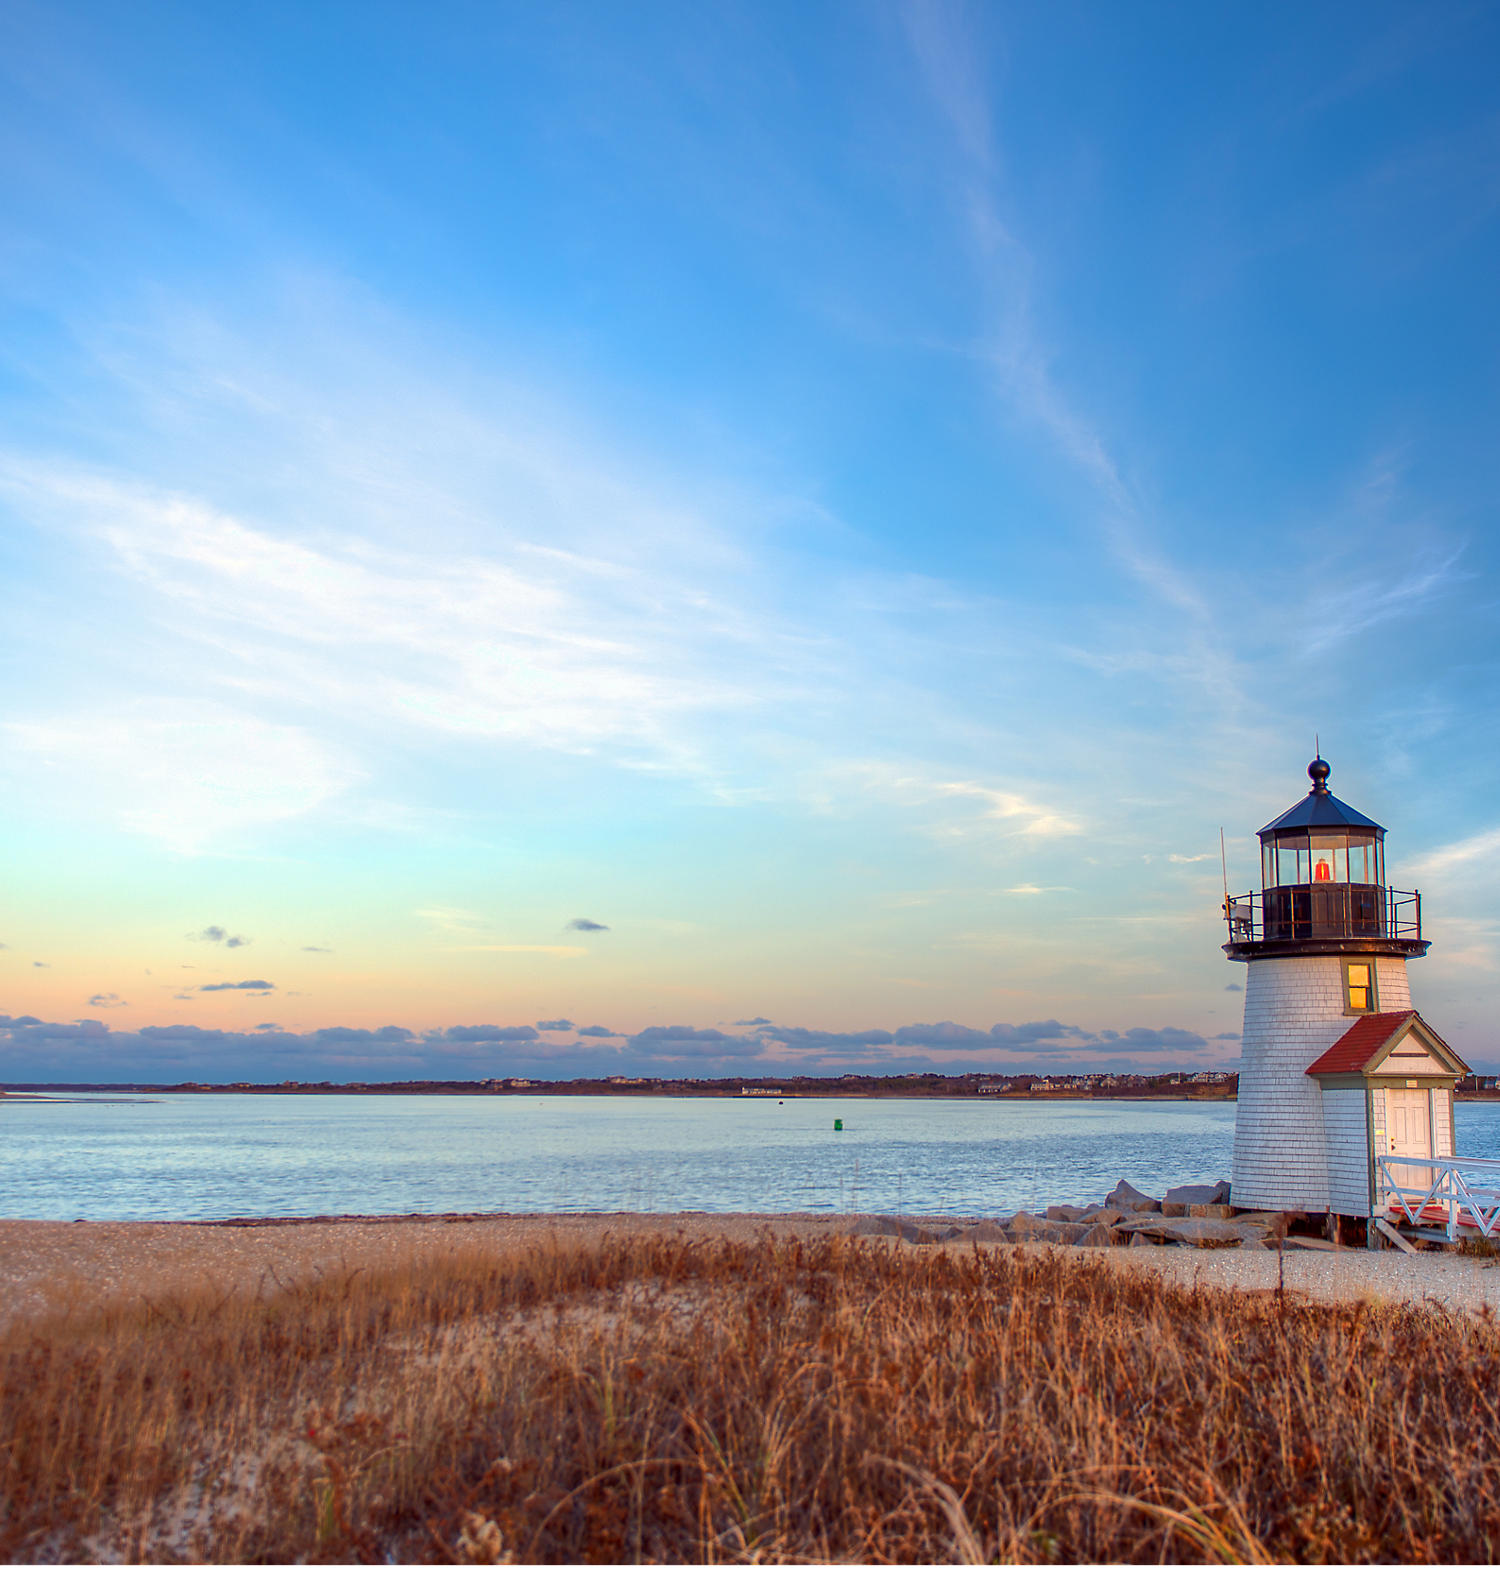 Vacation In Cape Code, Massachusetts